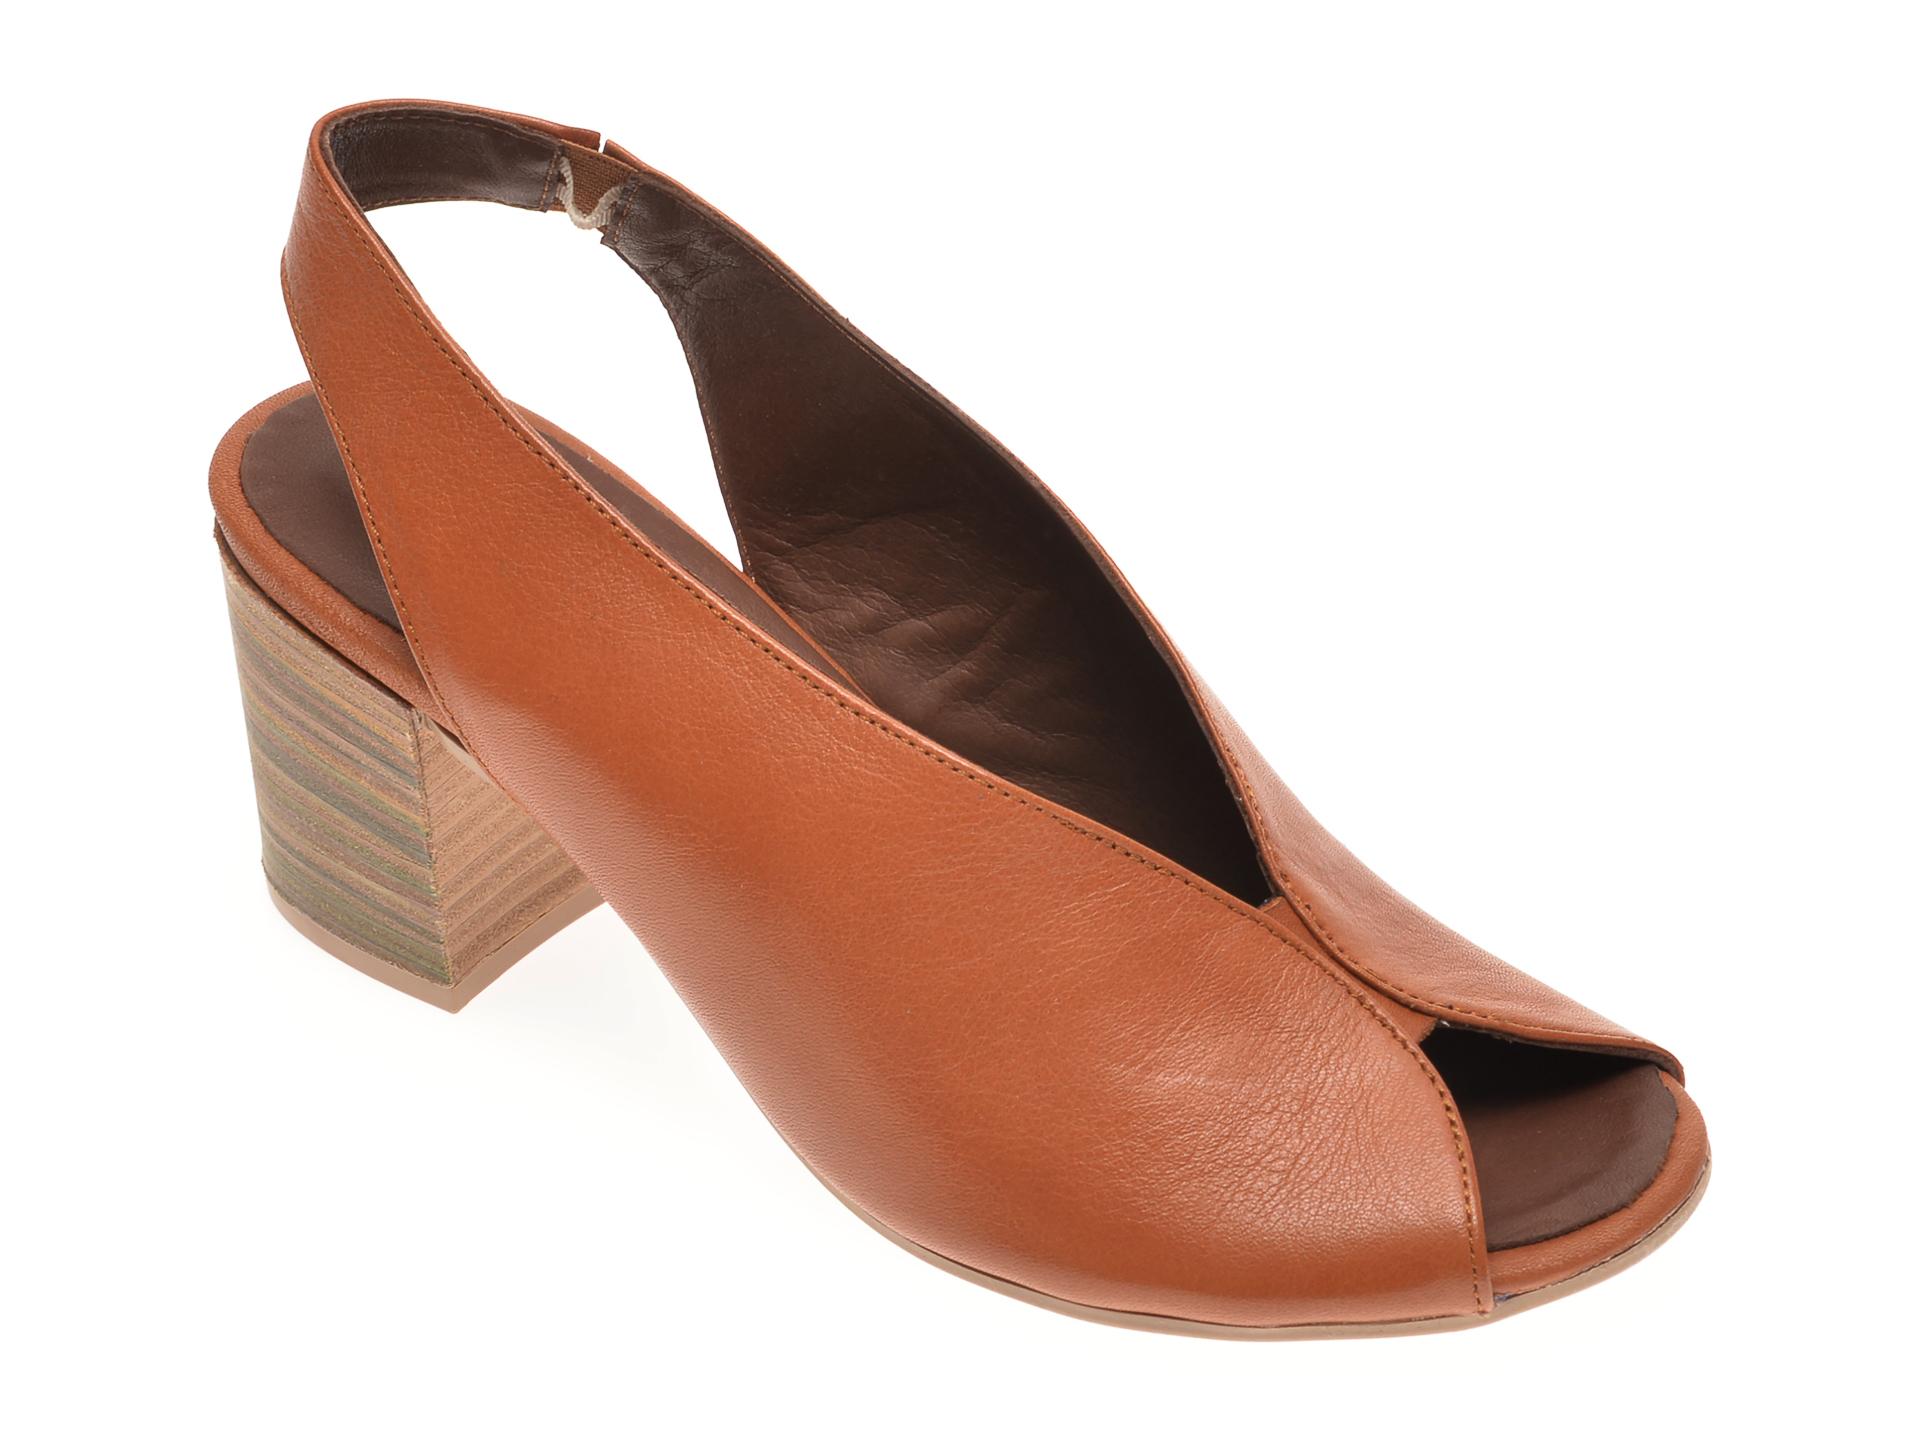 Sandale BABOOS maro, 1806, din piele naturala